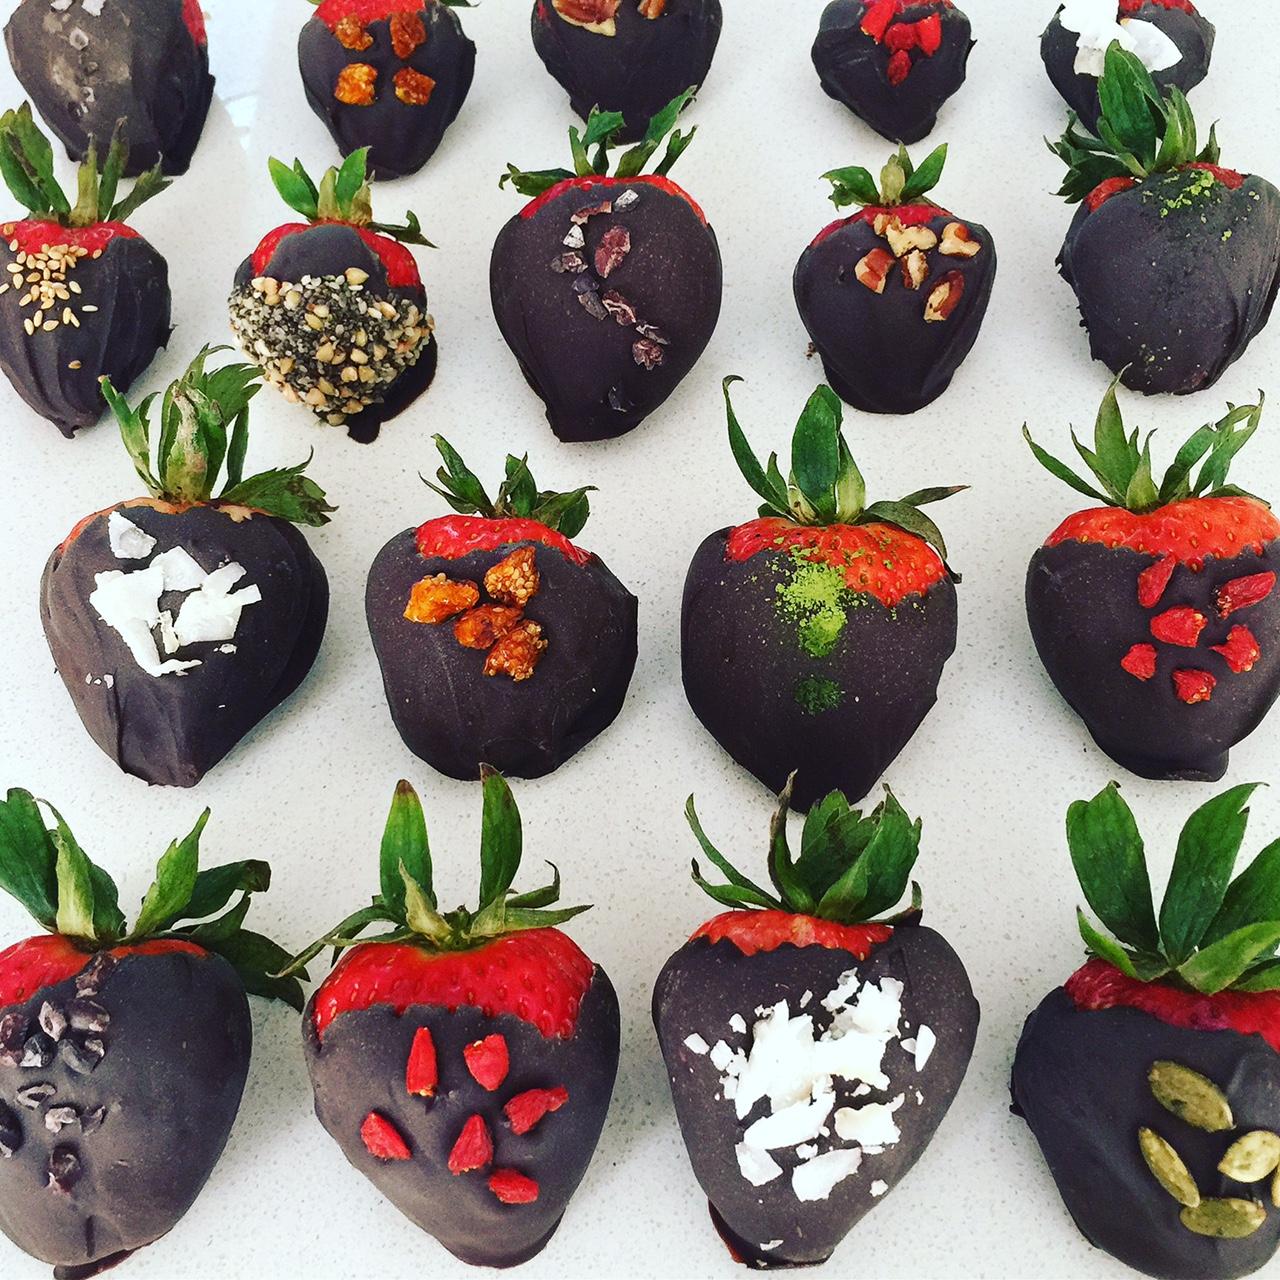 Superfood Chocolate Covered Strawberries